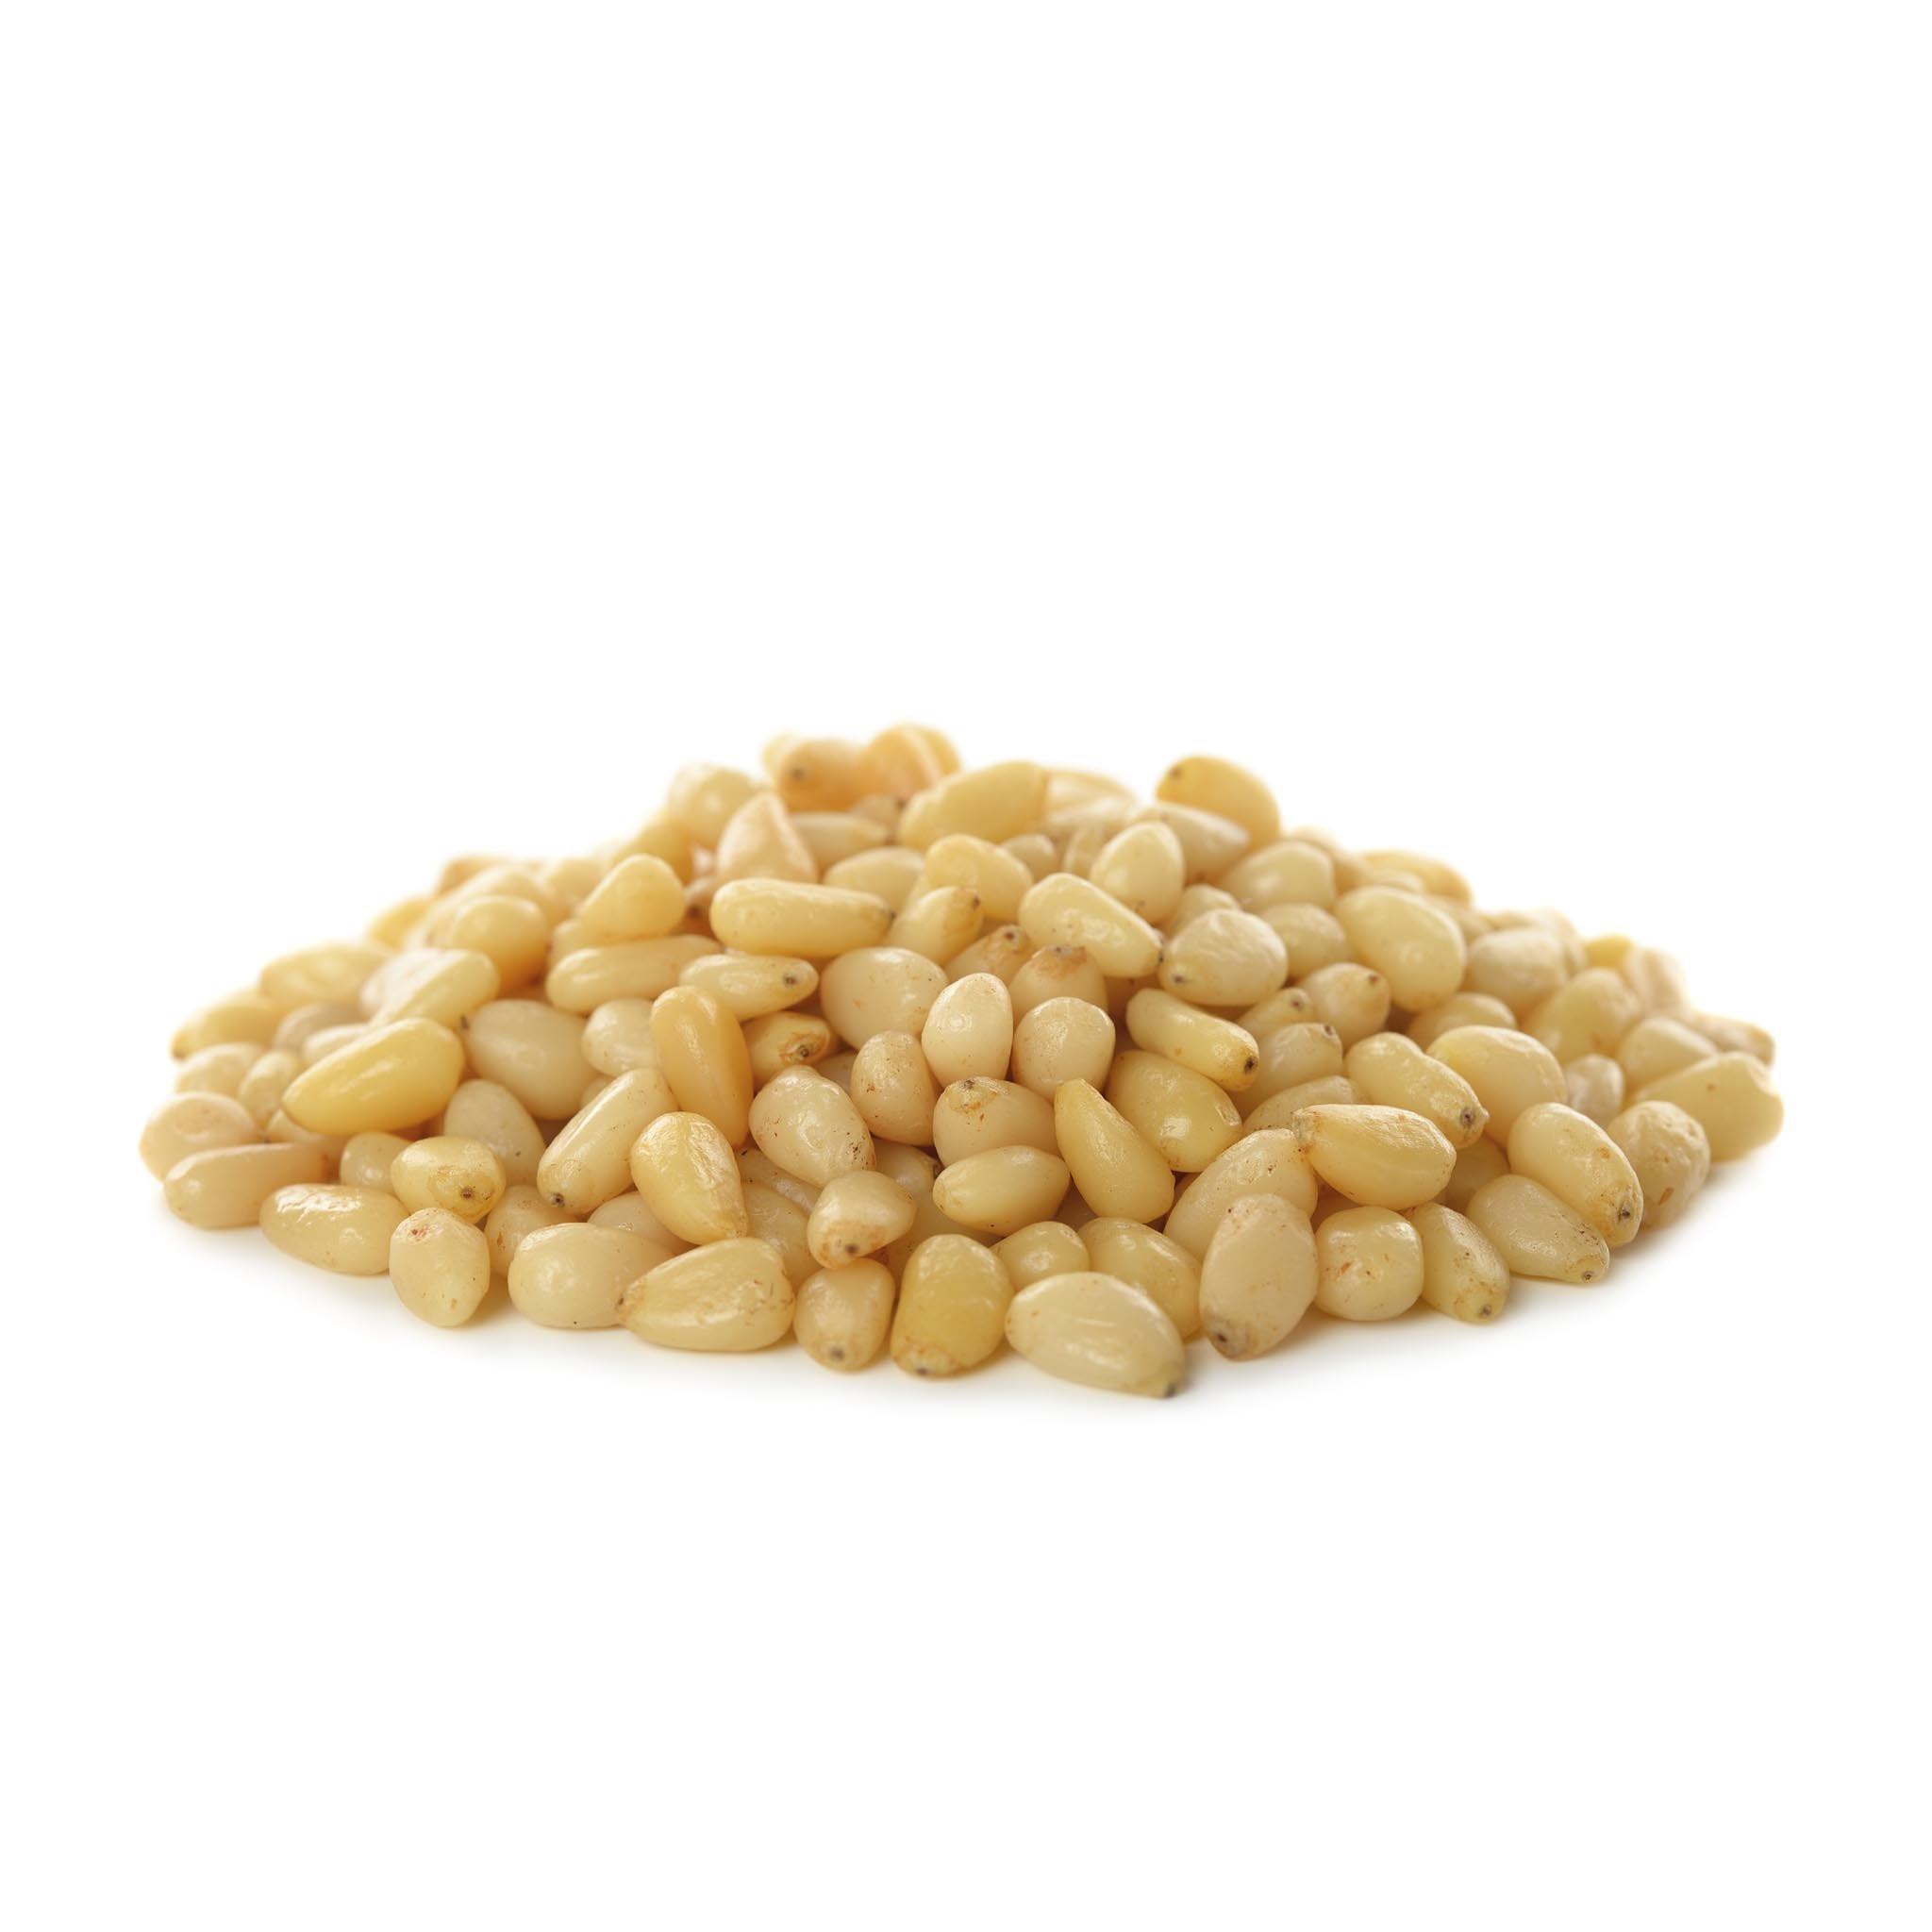 Organic Pine Nuts